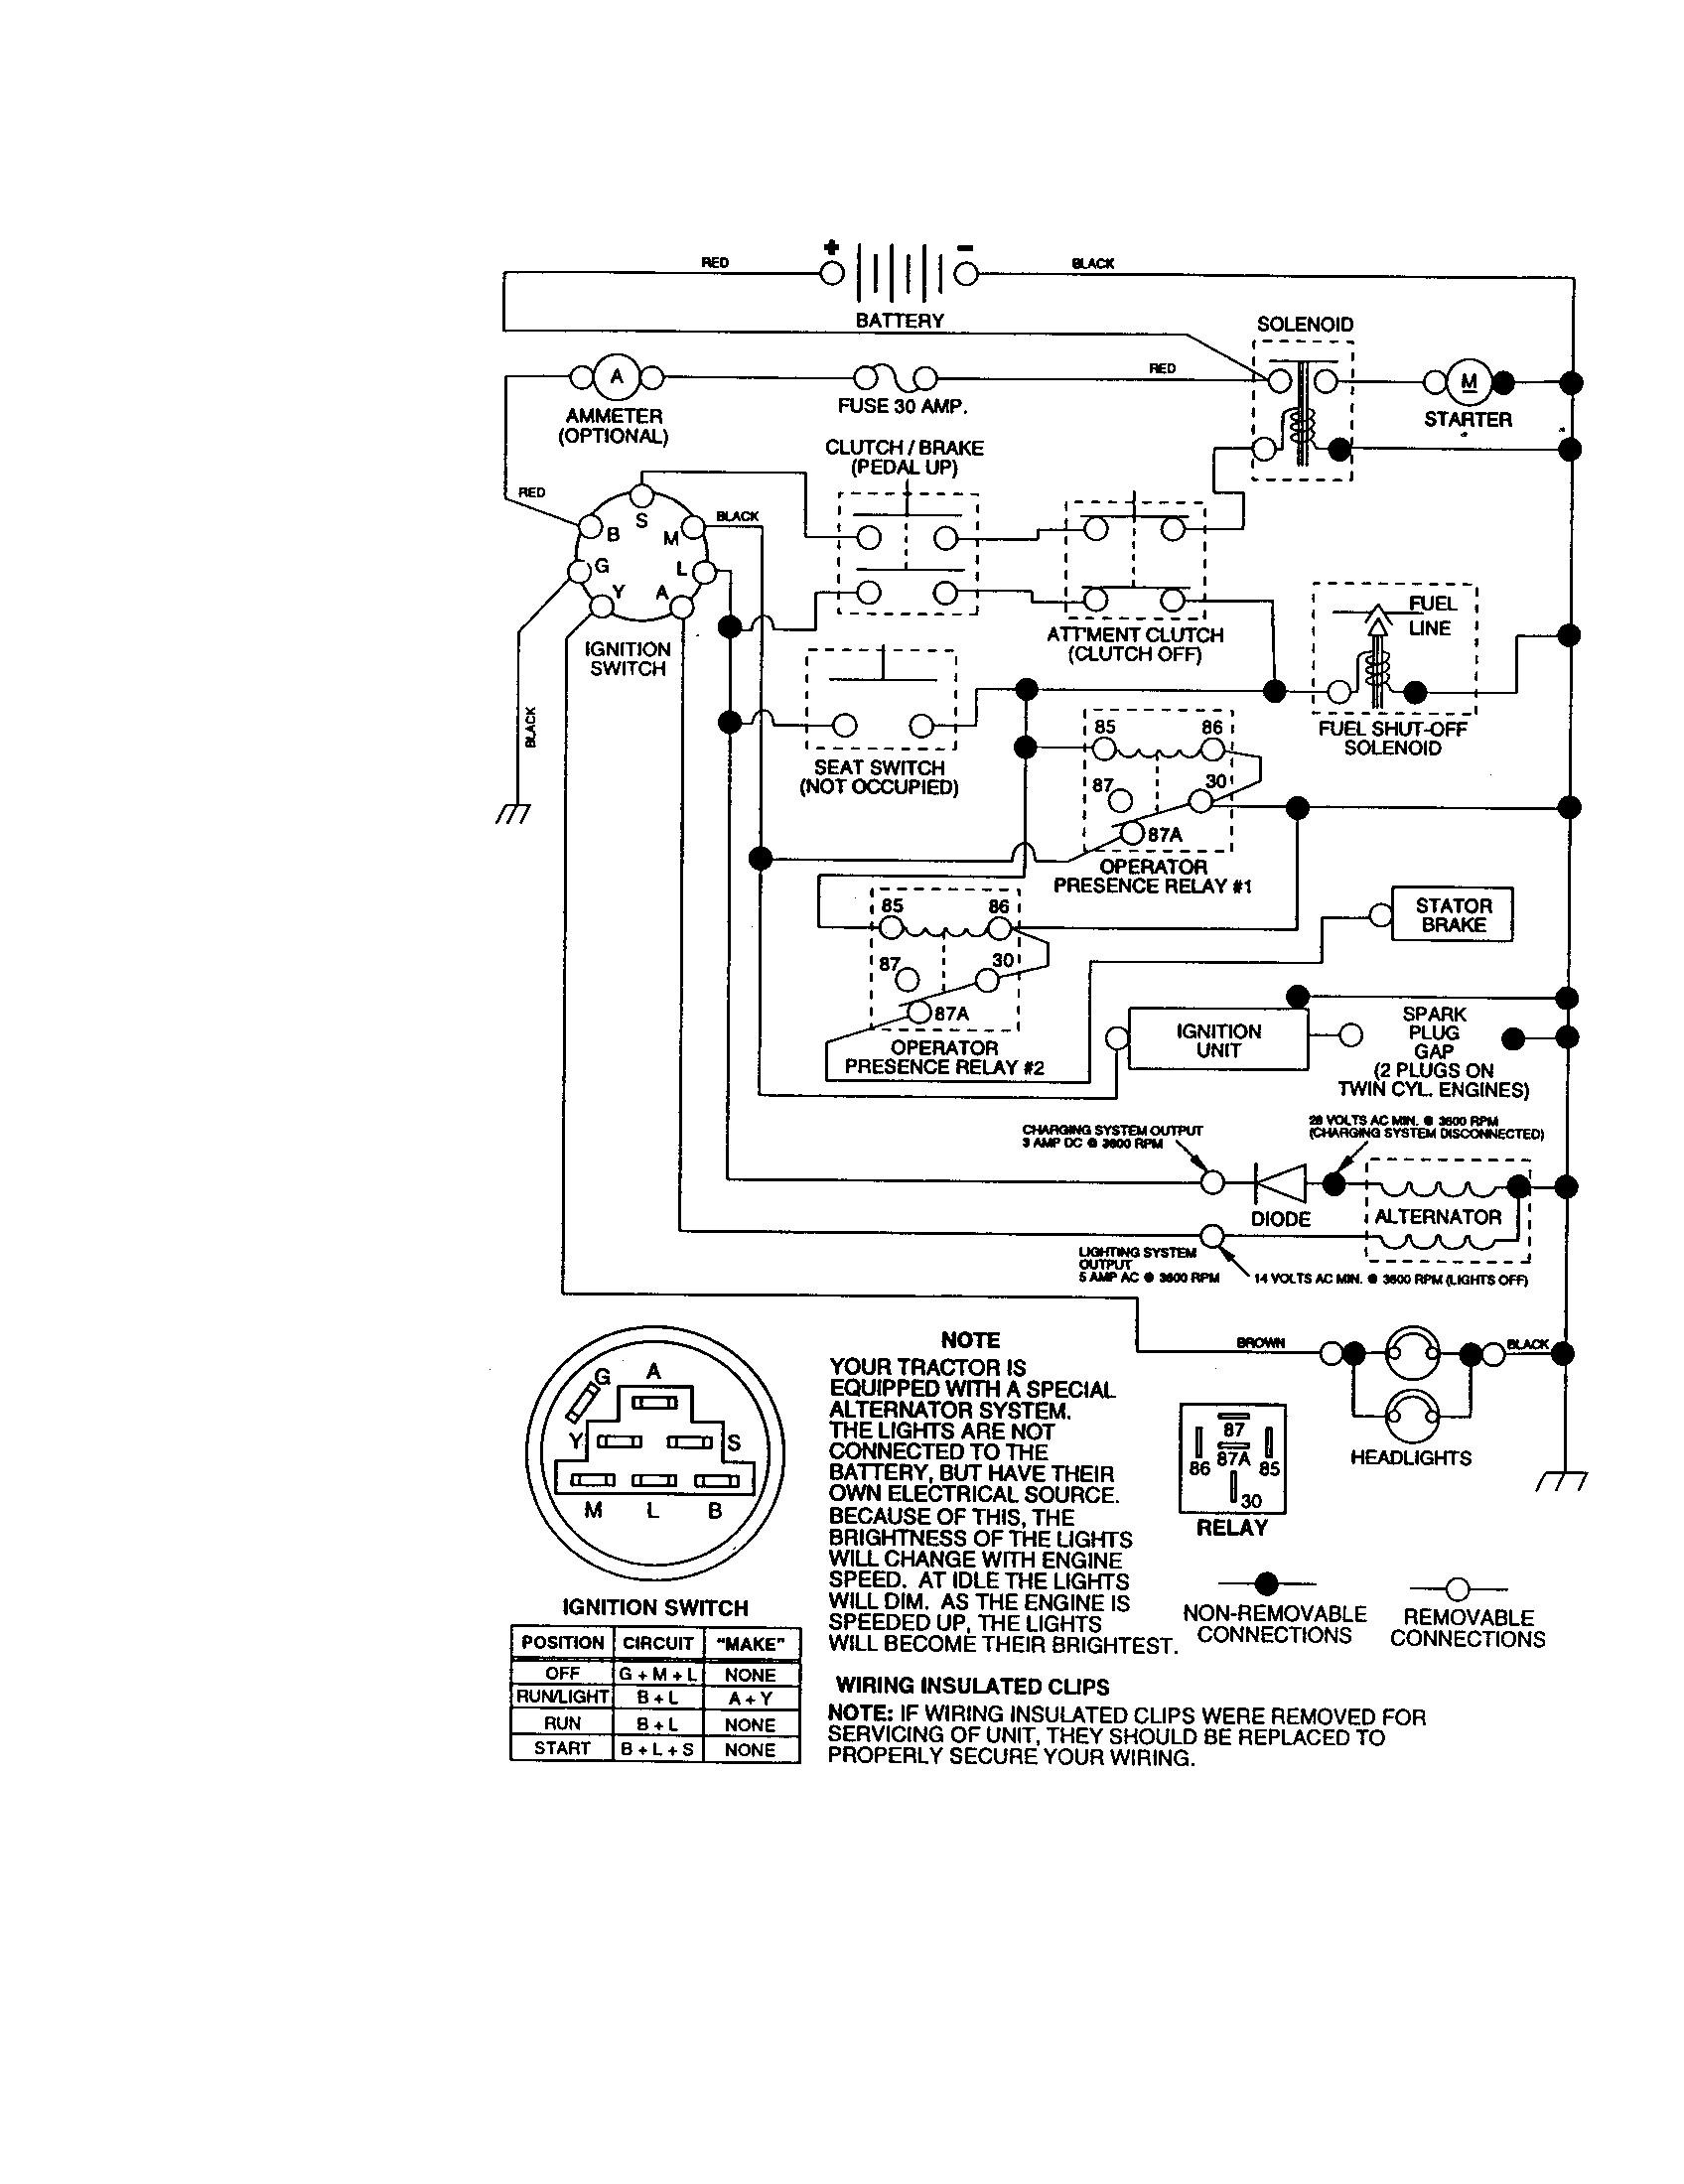 hight resolution of craftsman lawn mower model 917 wiring diagram wiring diagram for kohler mand new 917 craftsman